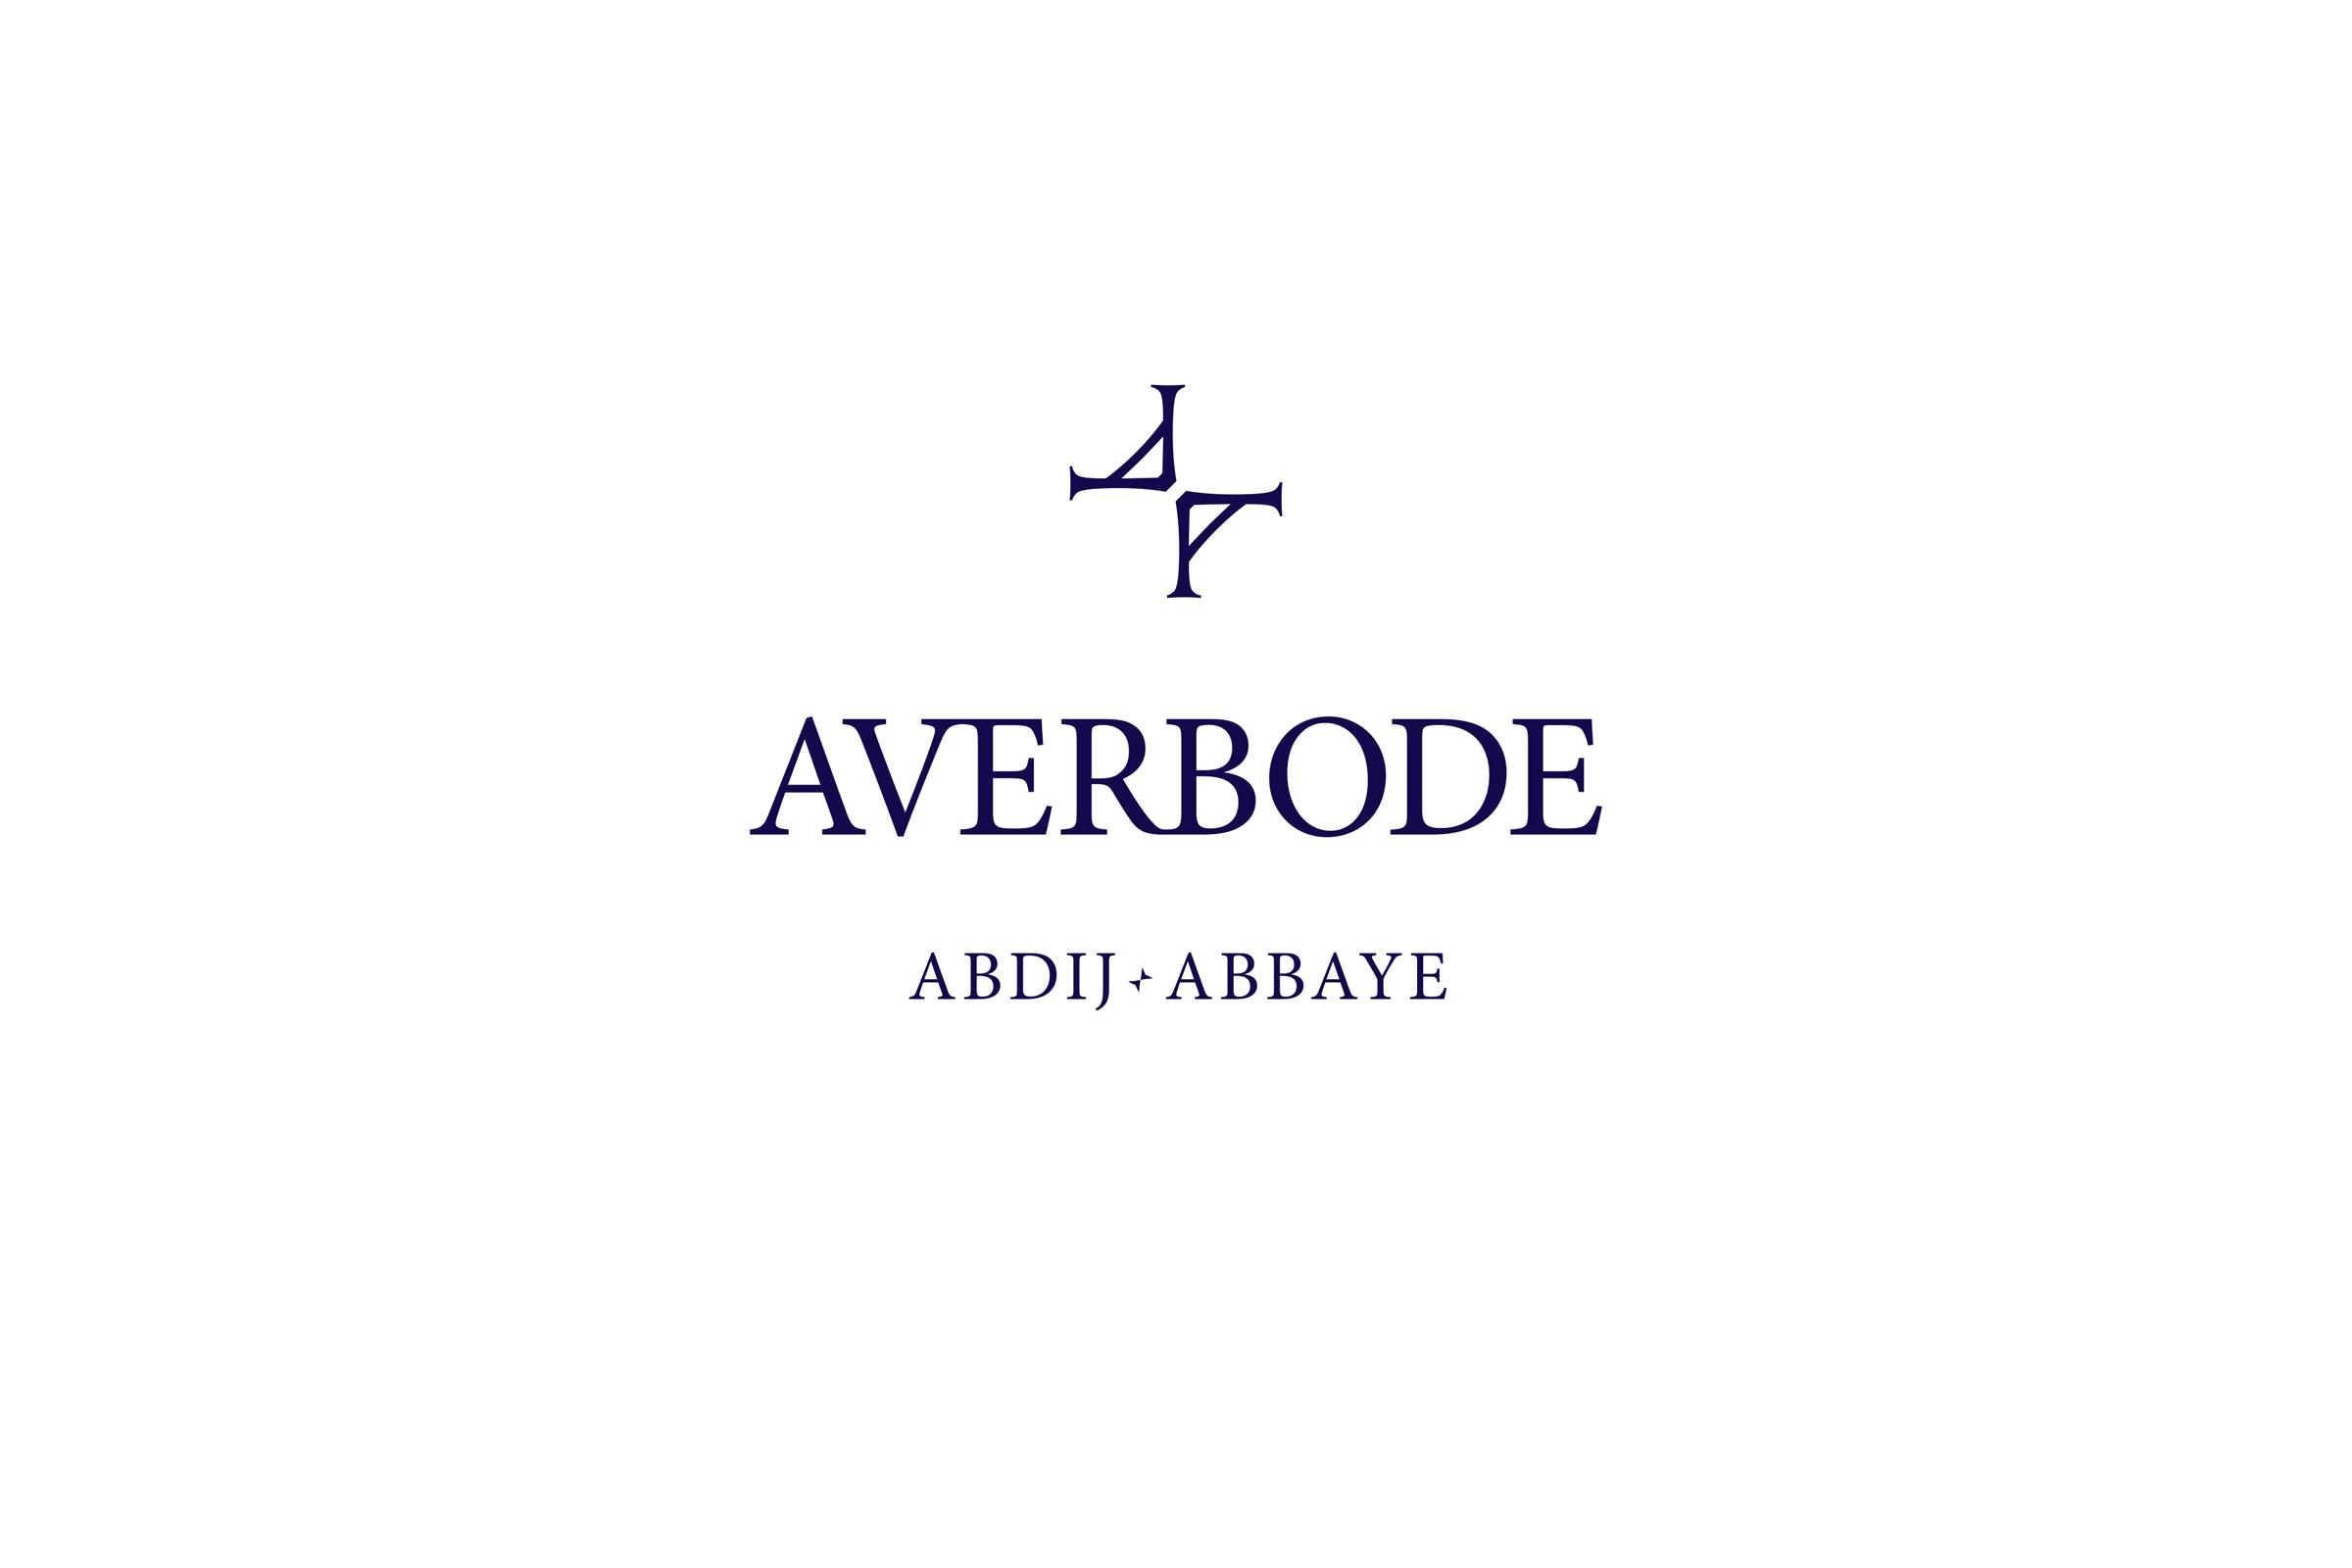 Logo van Brouwerij Averbode gevestigd in Mell uit